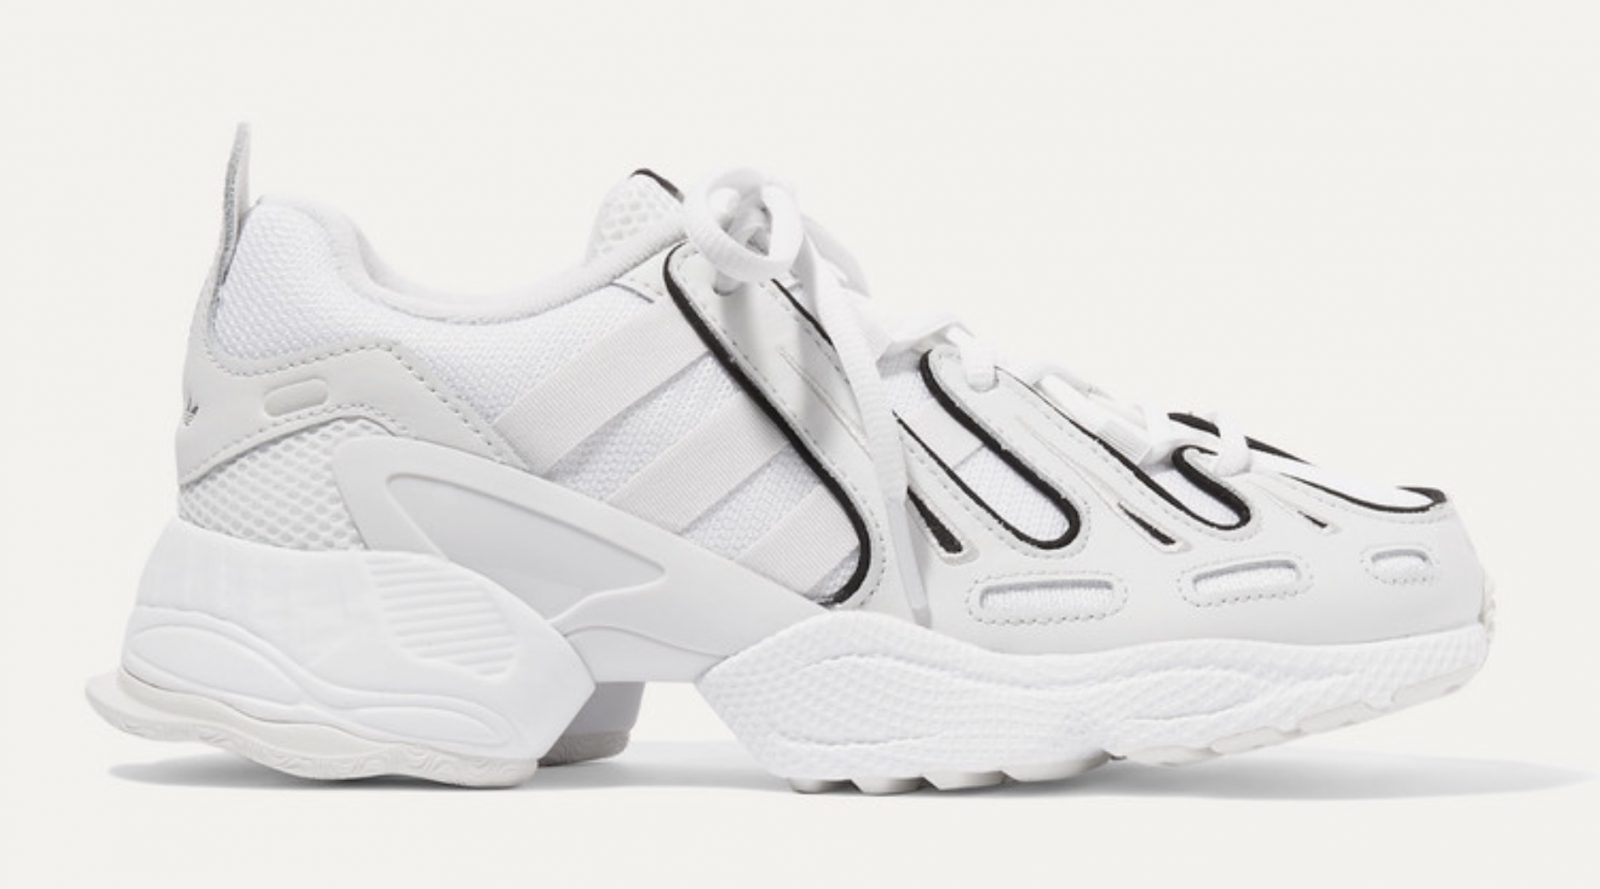 adidas EQT Gazelle White